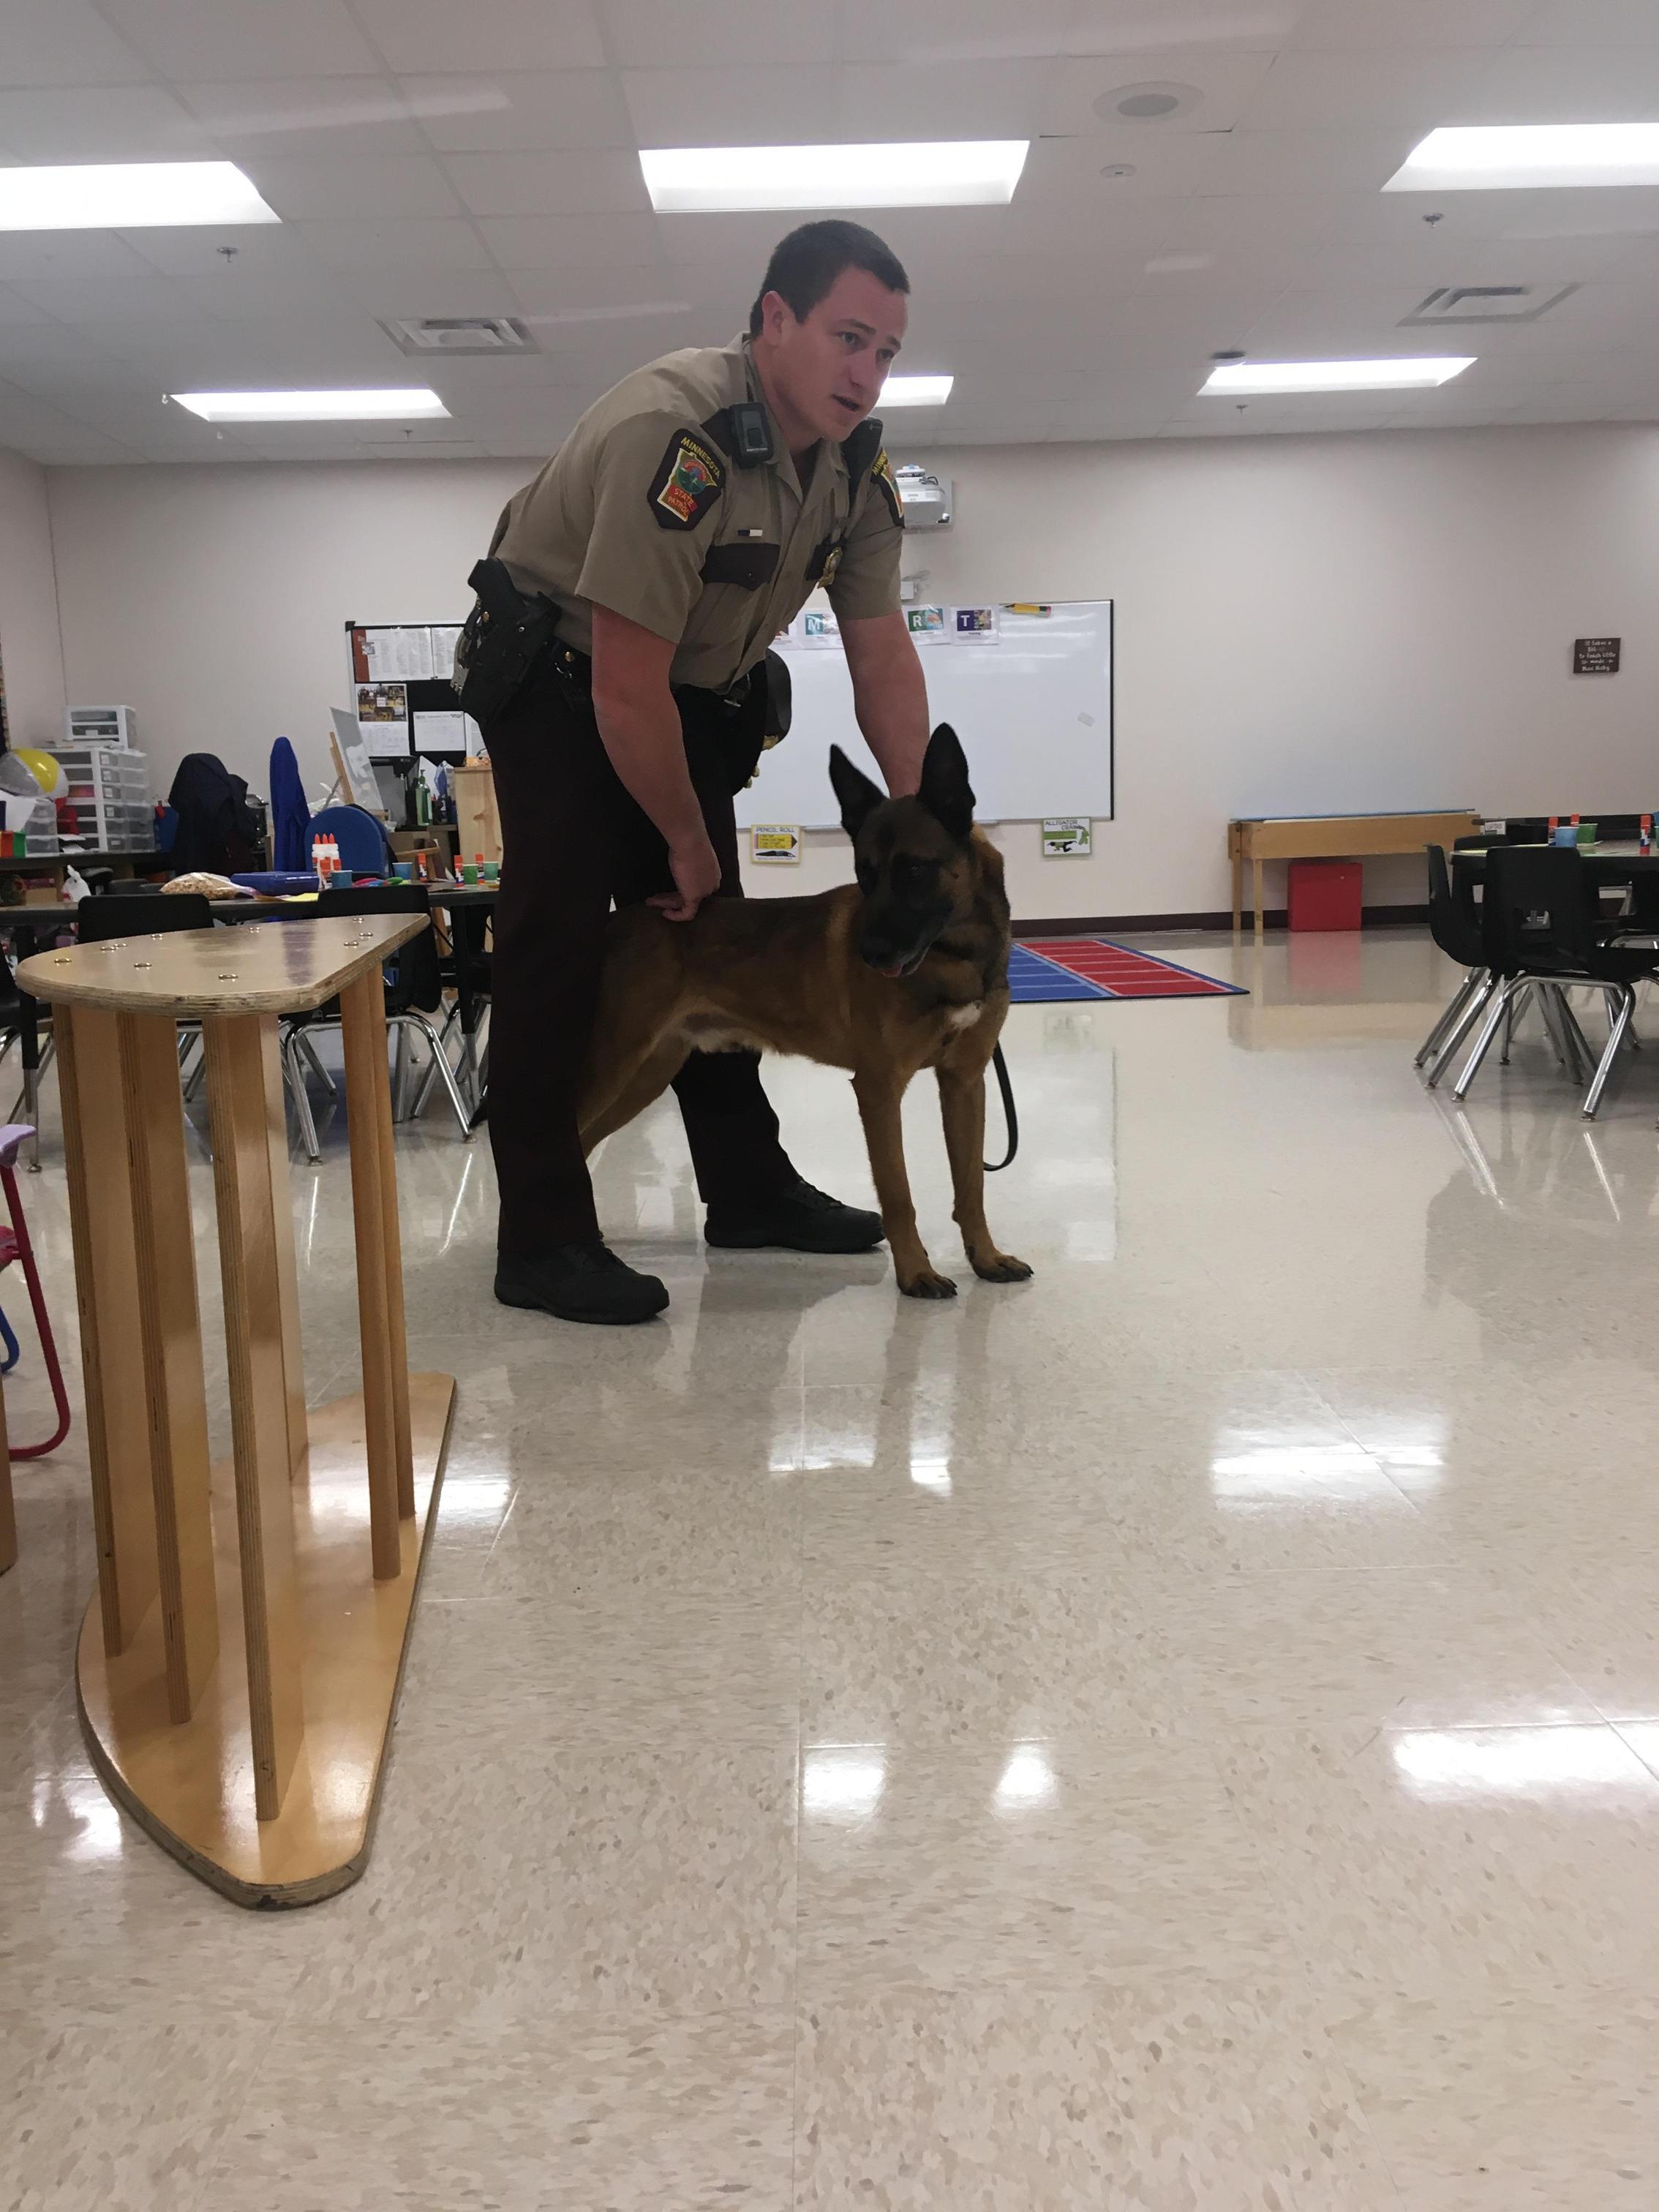 State Trooper visit